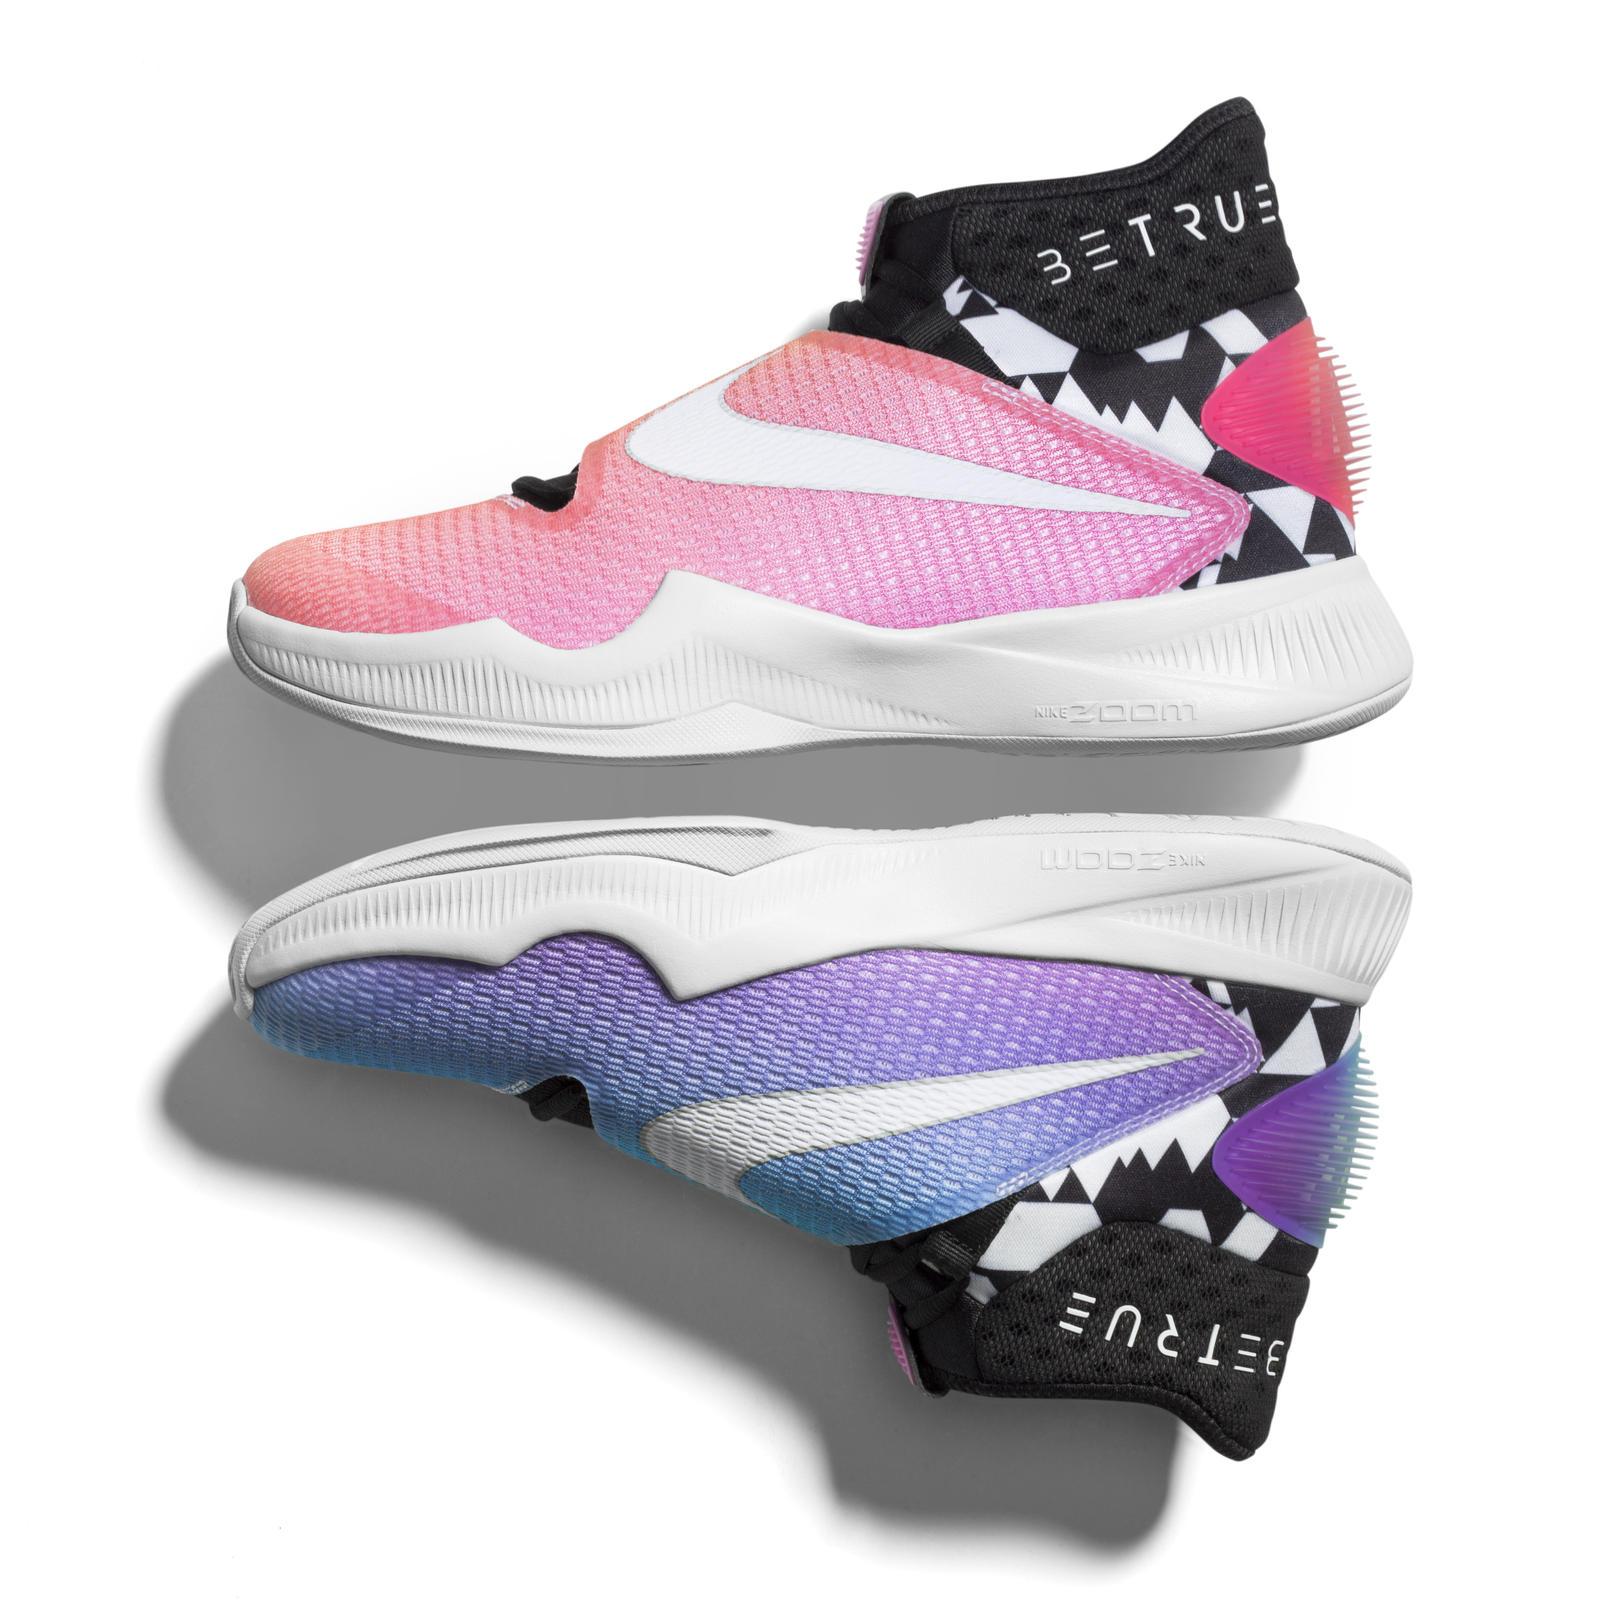 sale retailer d2d55 d615d Nike HyperRev 2016